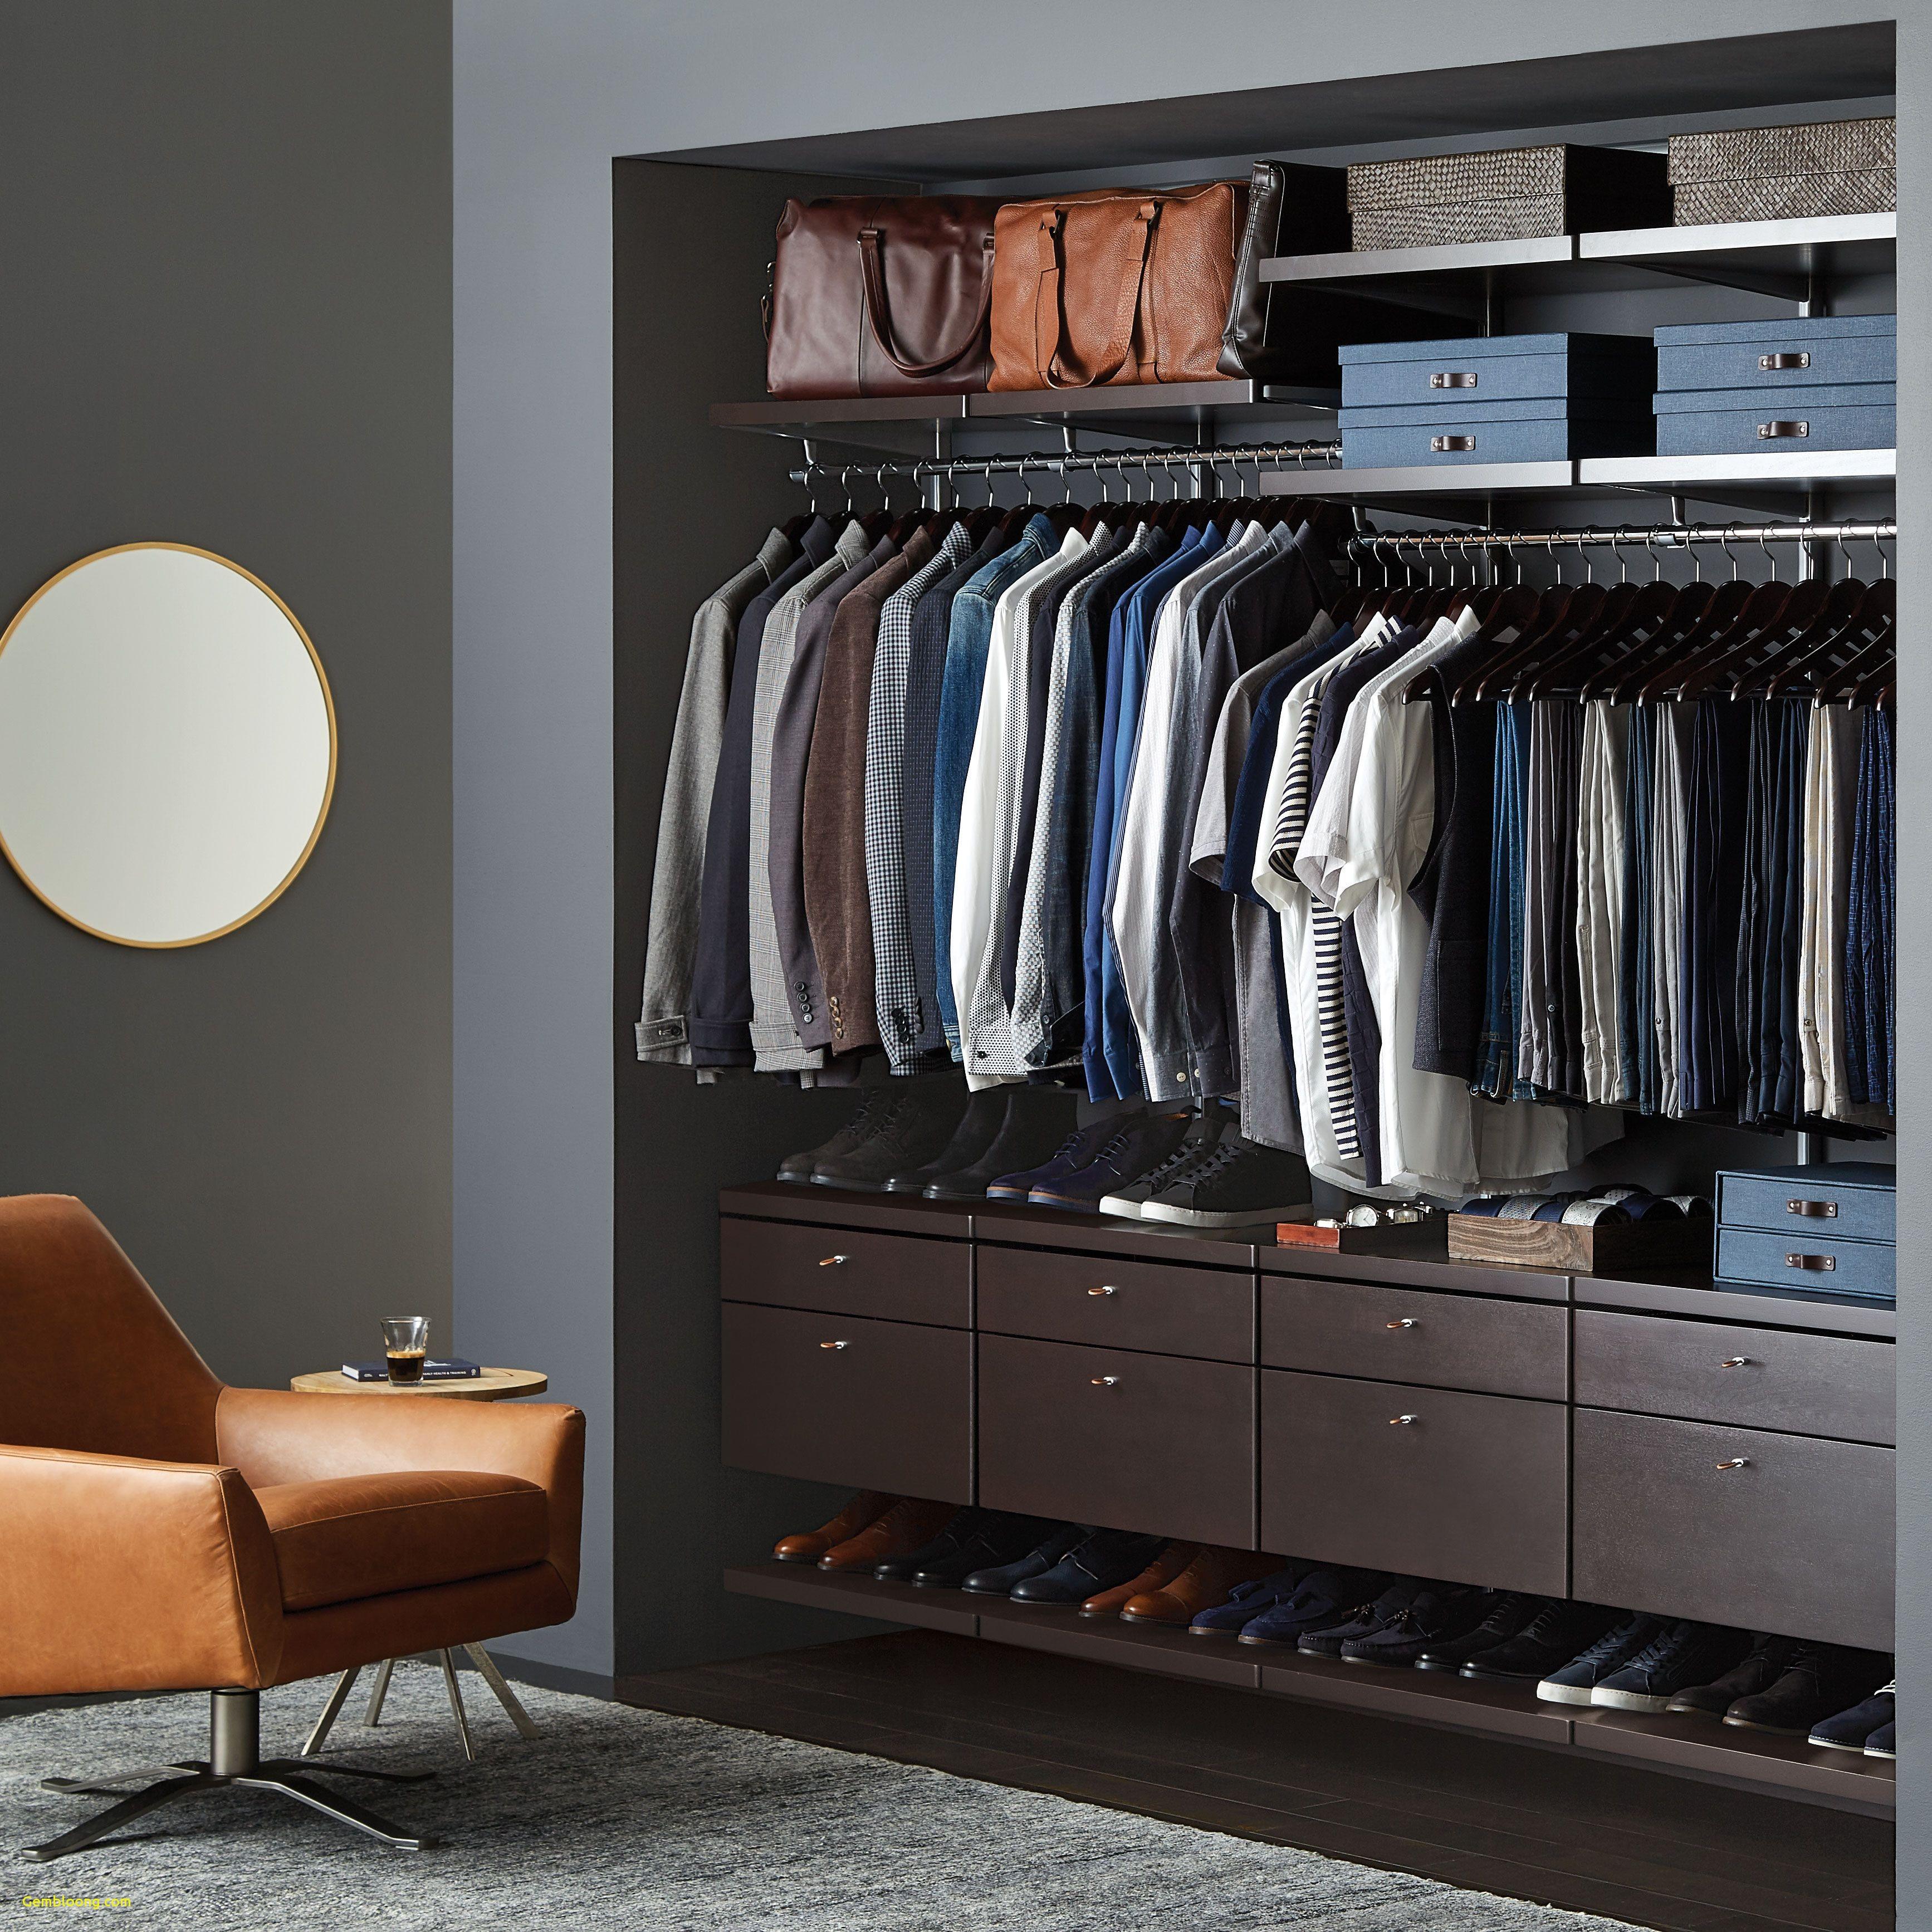 Vanity Master Bedroom Closet Of Elfa For Best Organizer Ideas Elfa